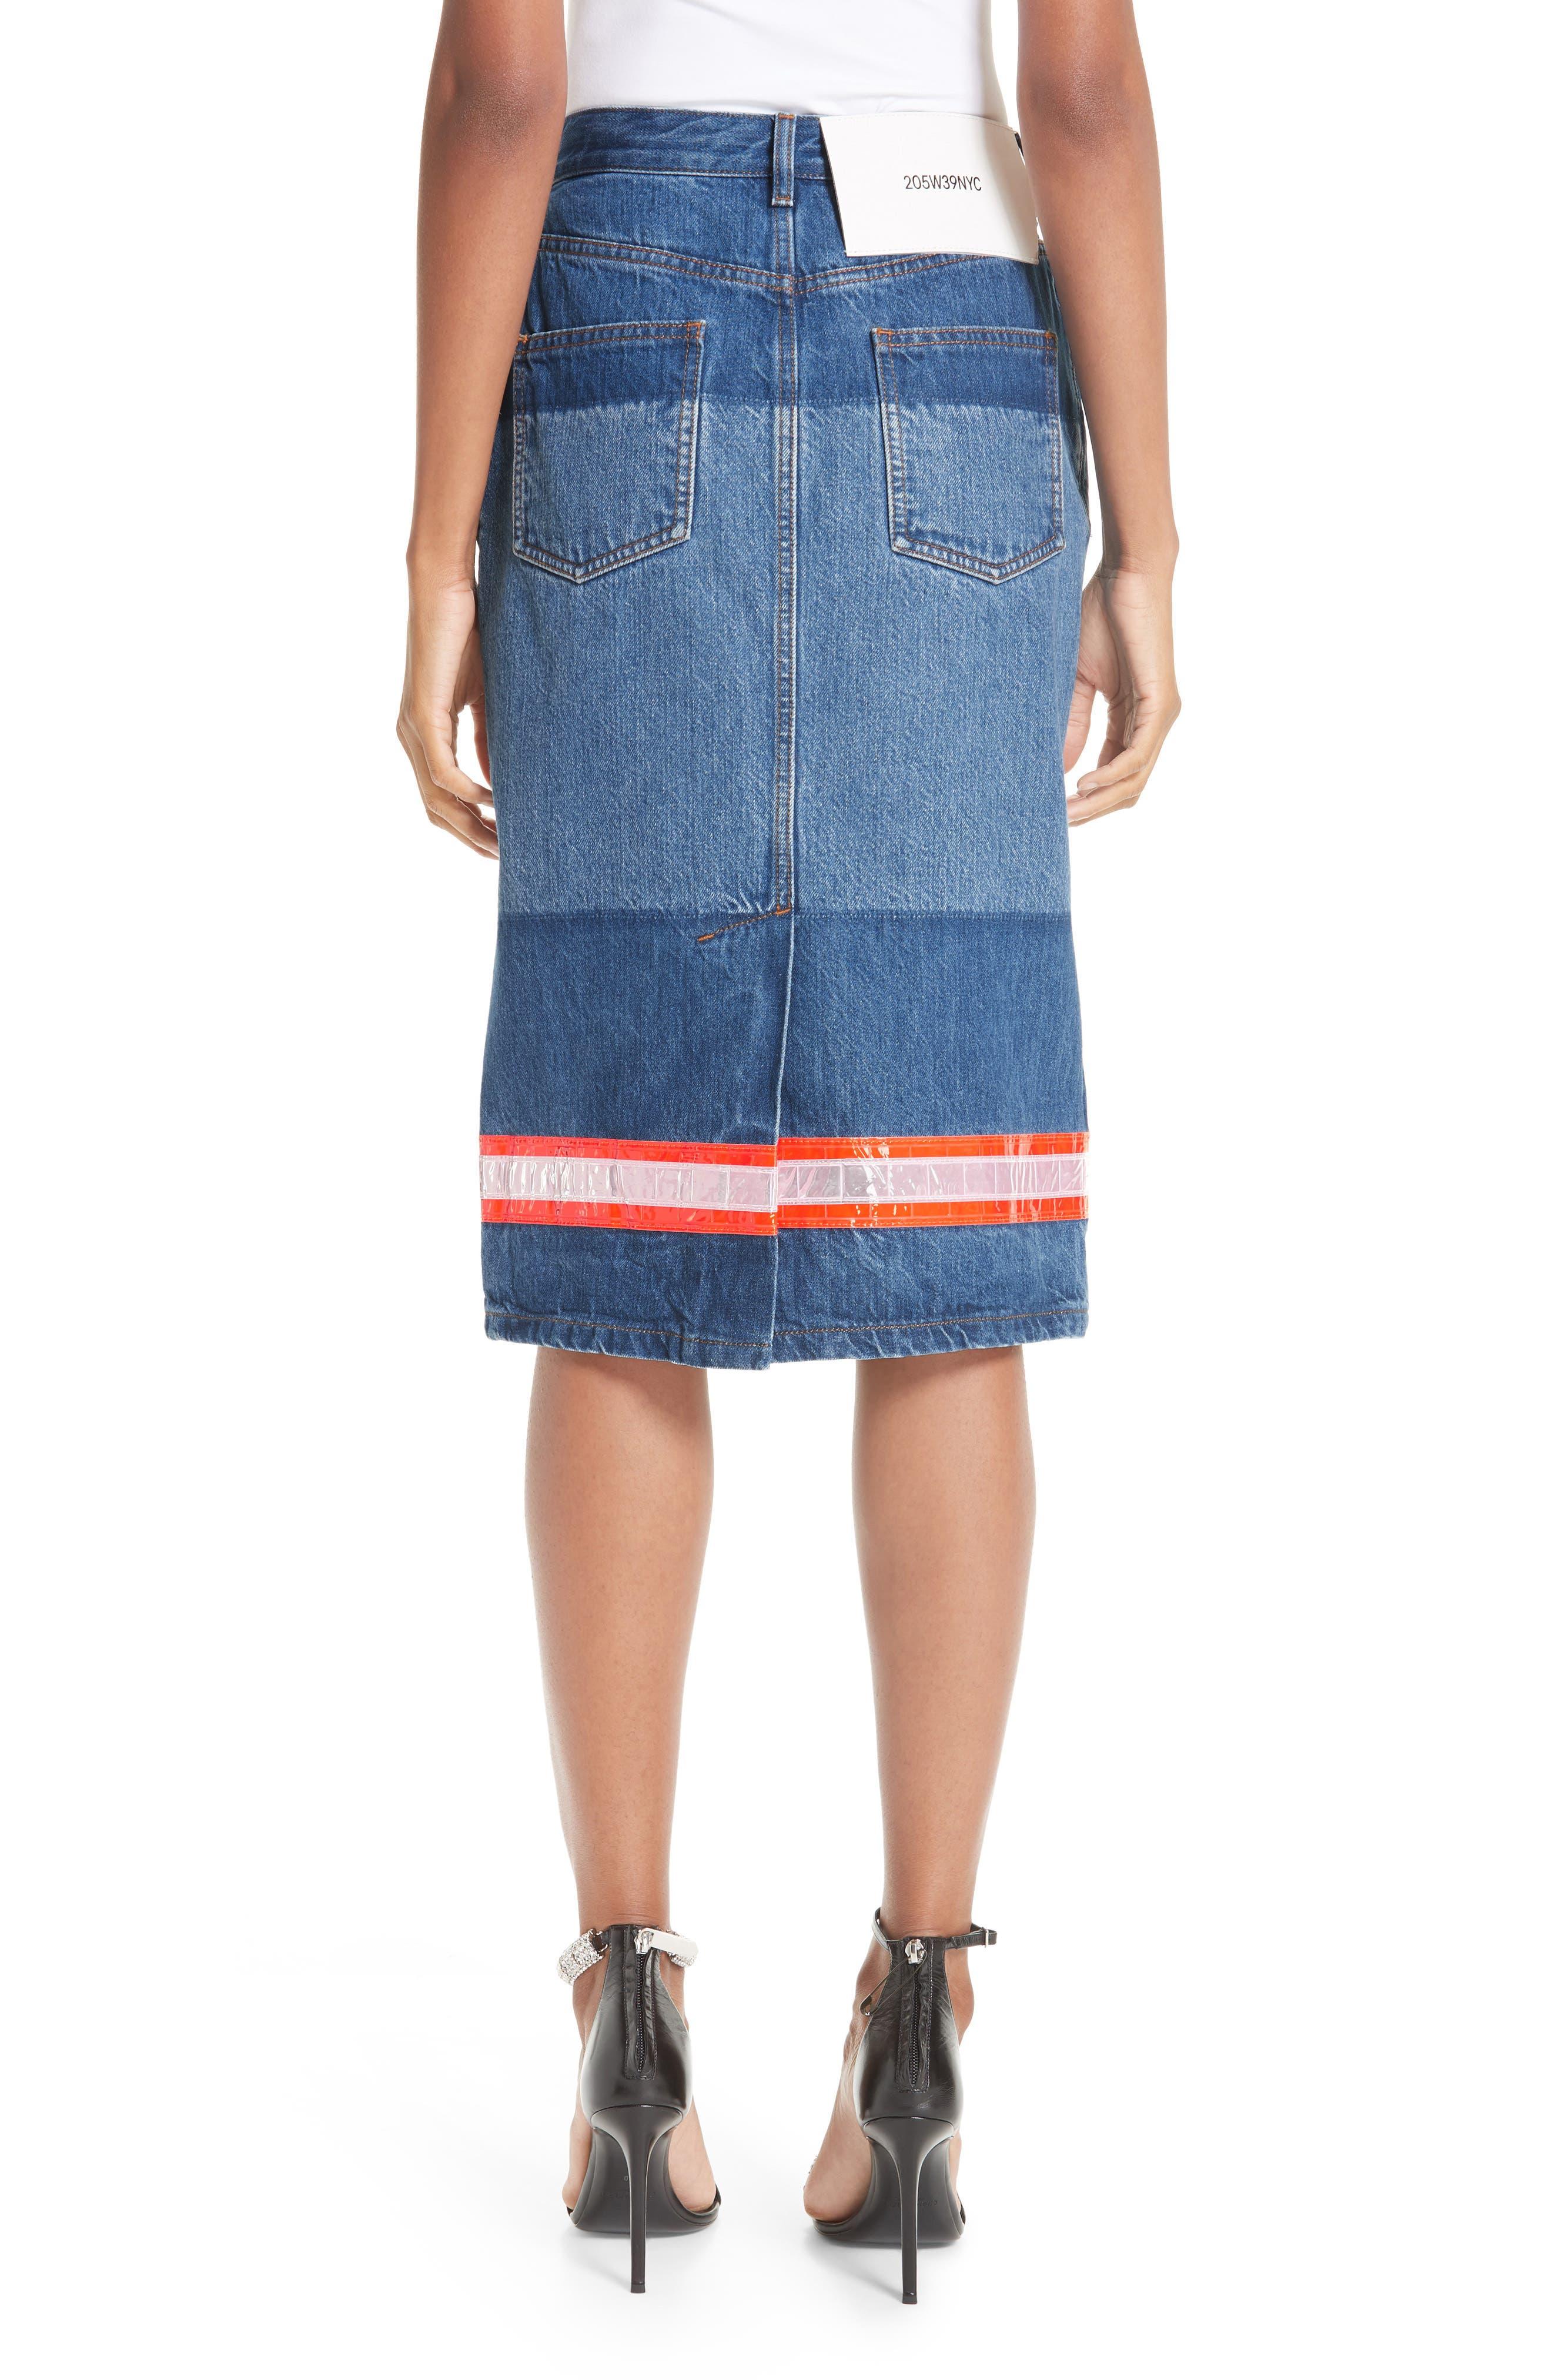 CALVIN KLEIN 205W39NYC, Reflective Stripe Mixed Wash Denim Skirt, Alternate thumbnail 2, color, BLUE